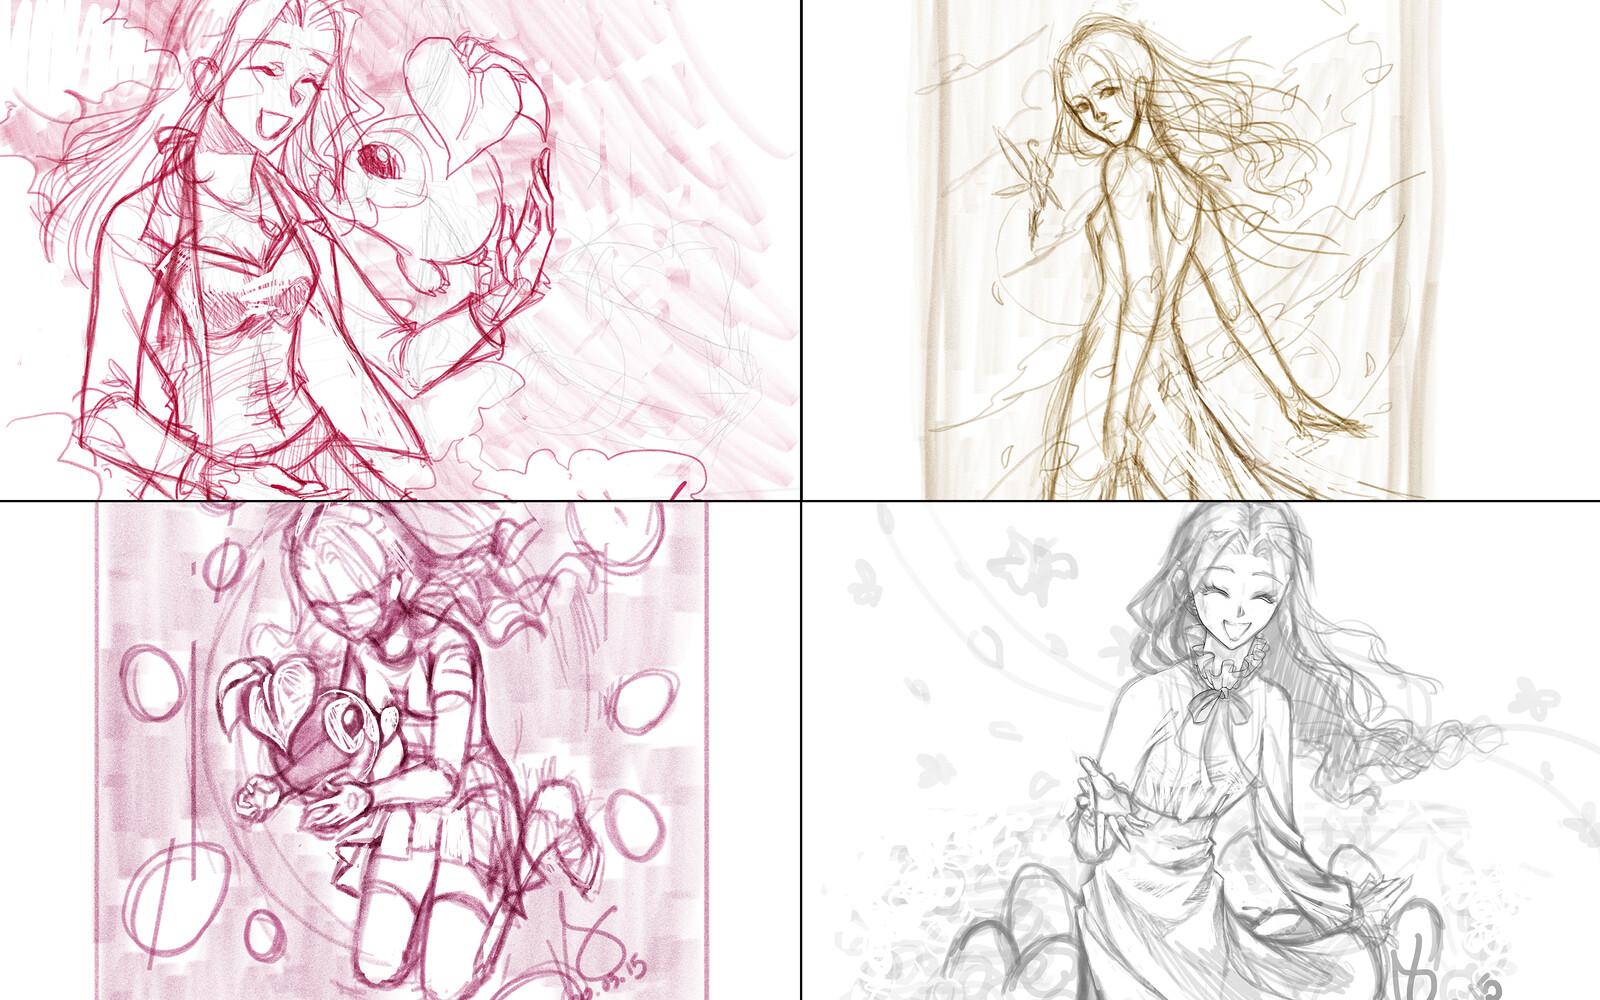 Concept sketches done in Adobe Fresco